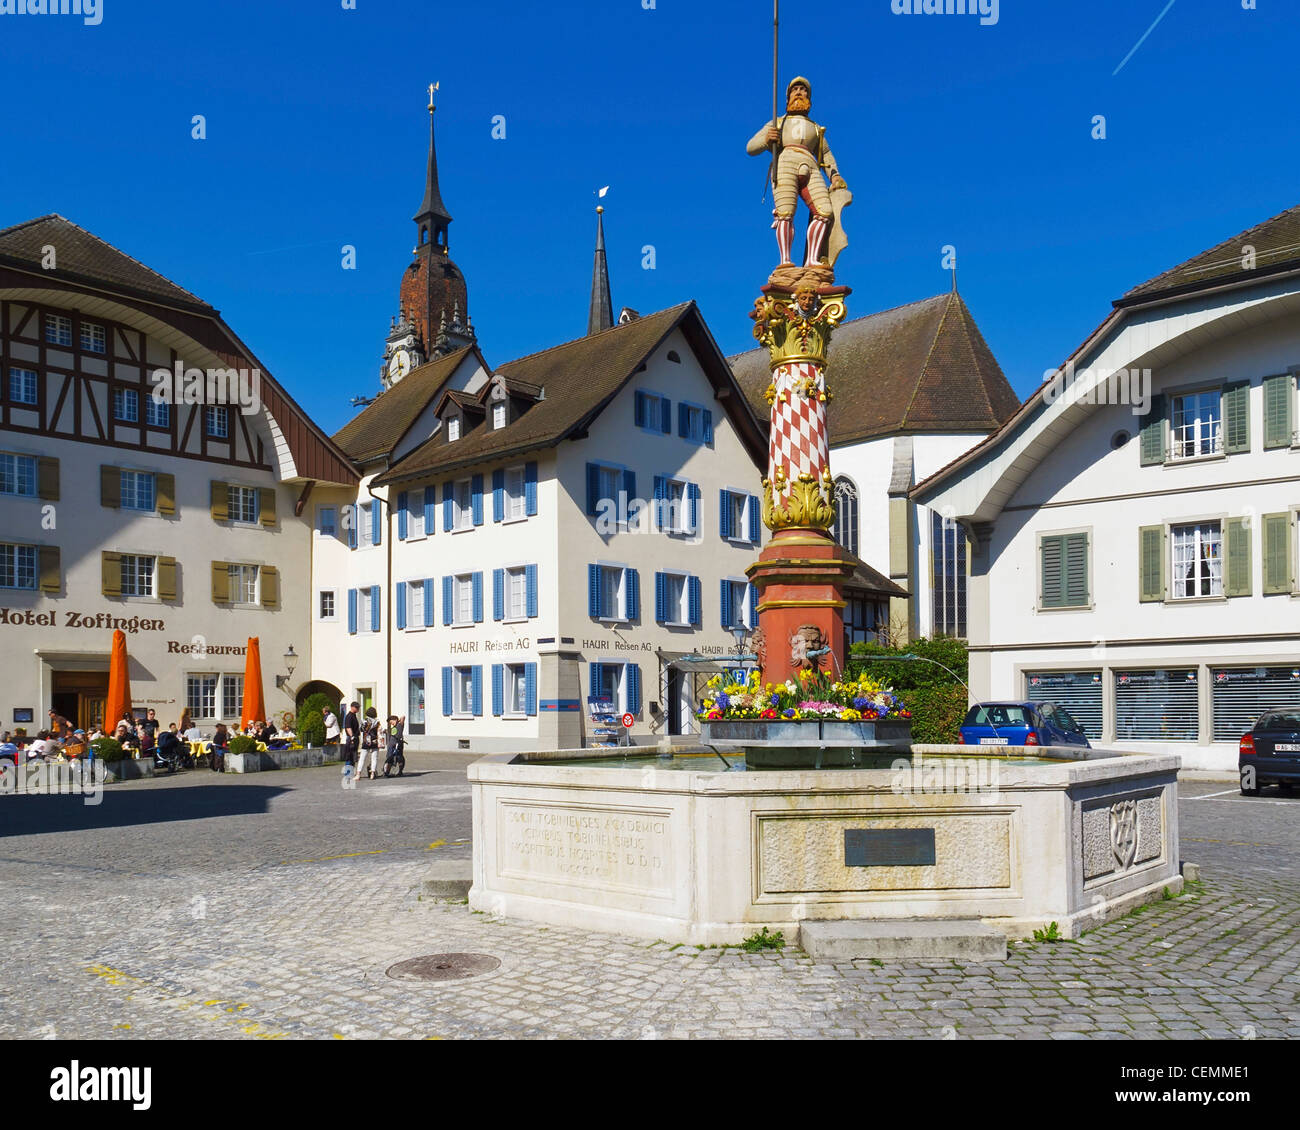 Statue of Niklaus Thut in Zofingen, Argovia, Switzerland. - Stock Image